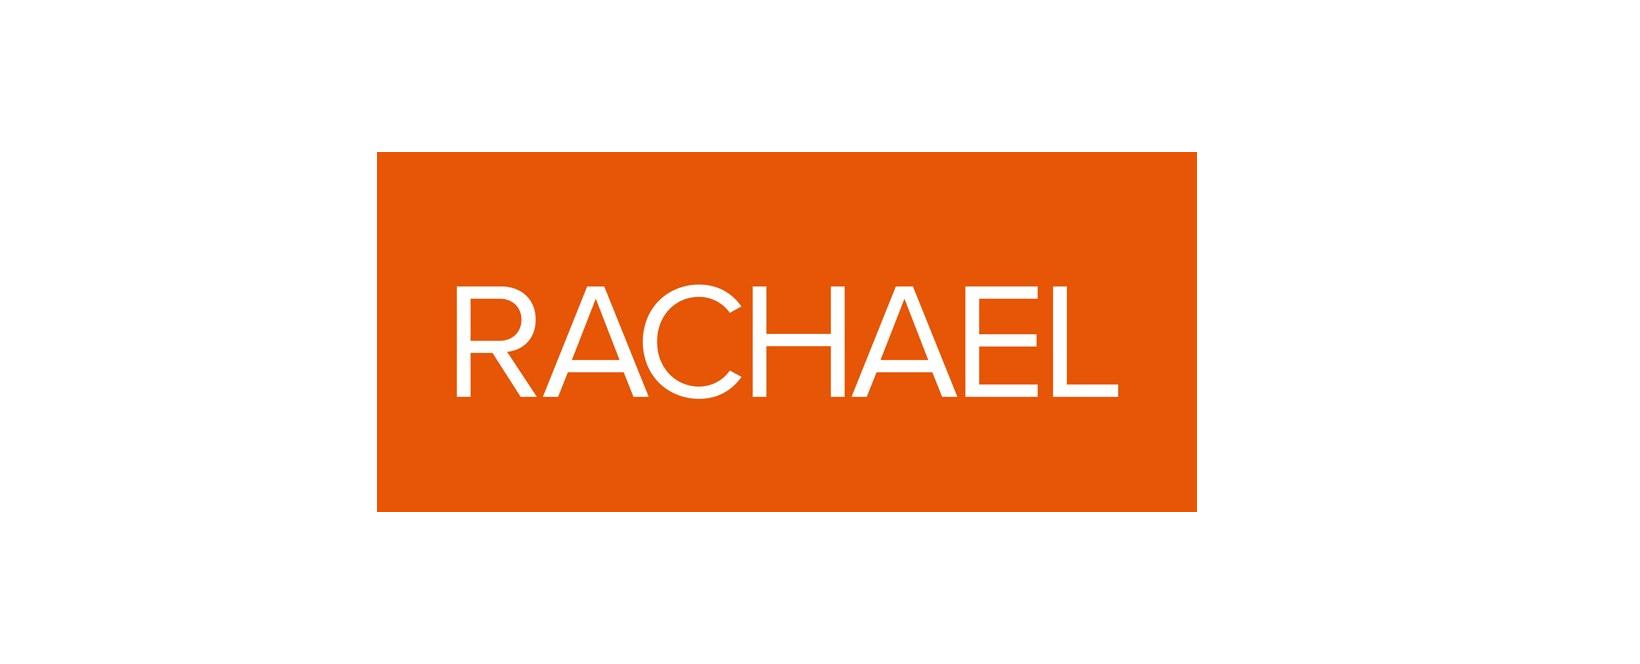 Rachael Ray Discount Code 2021